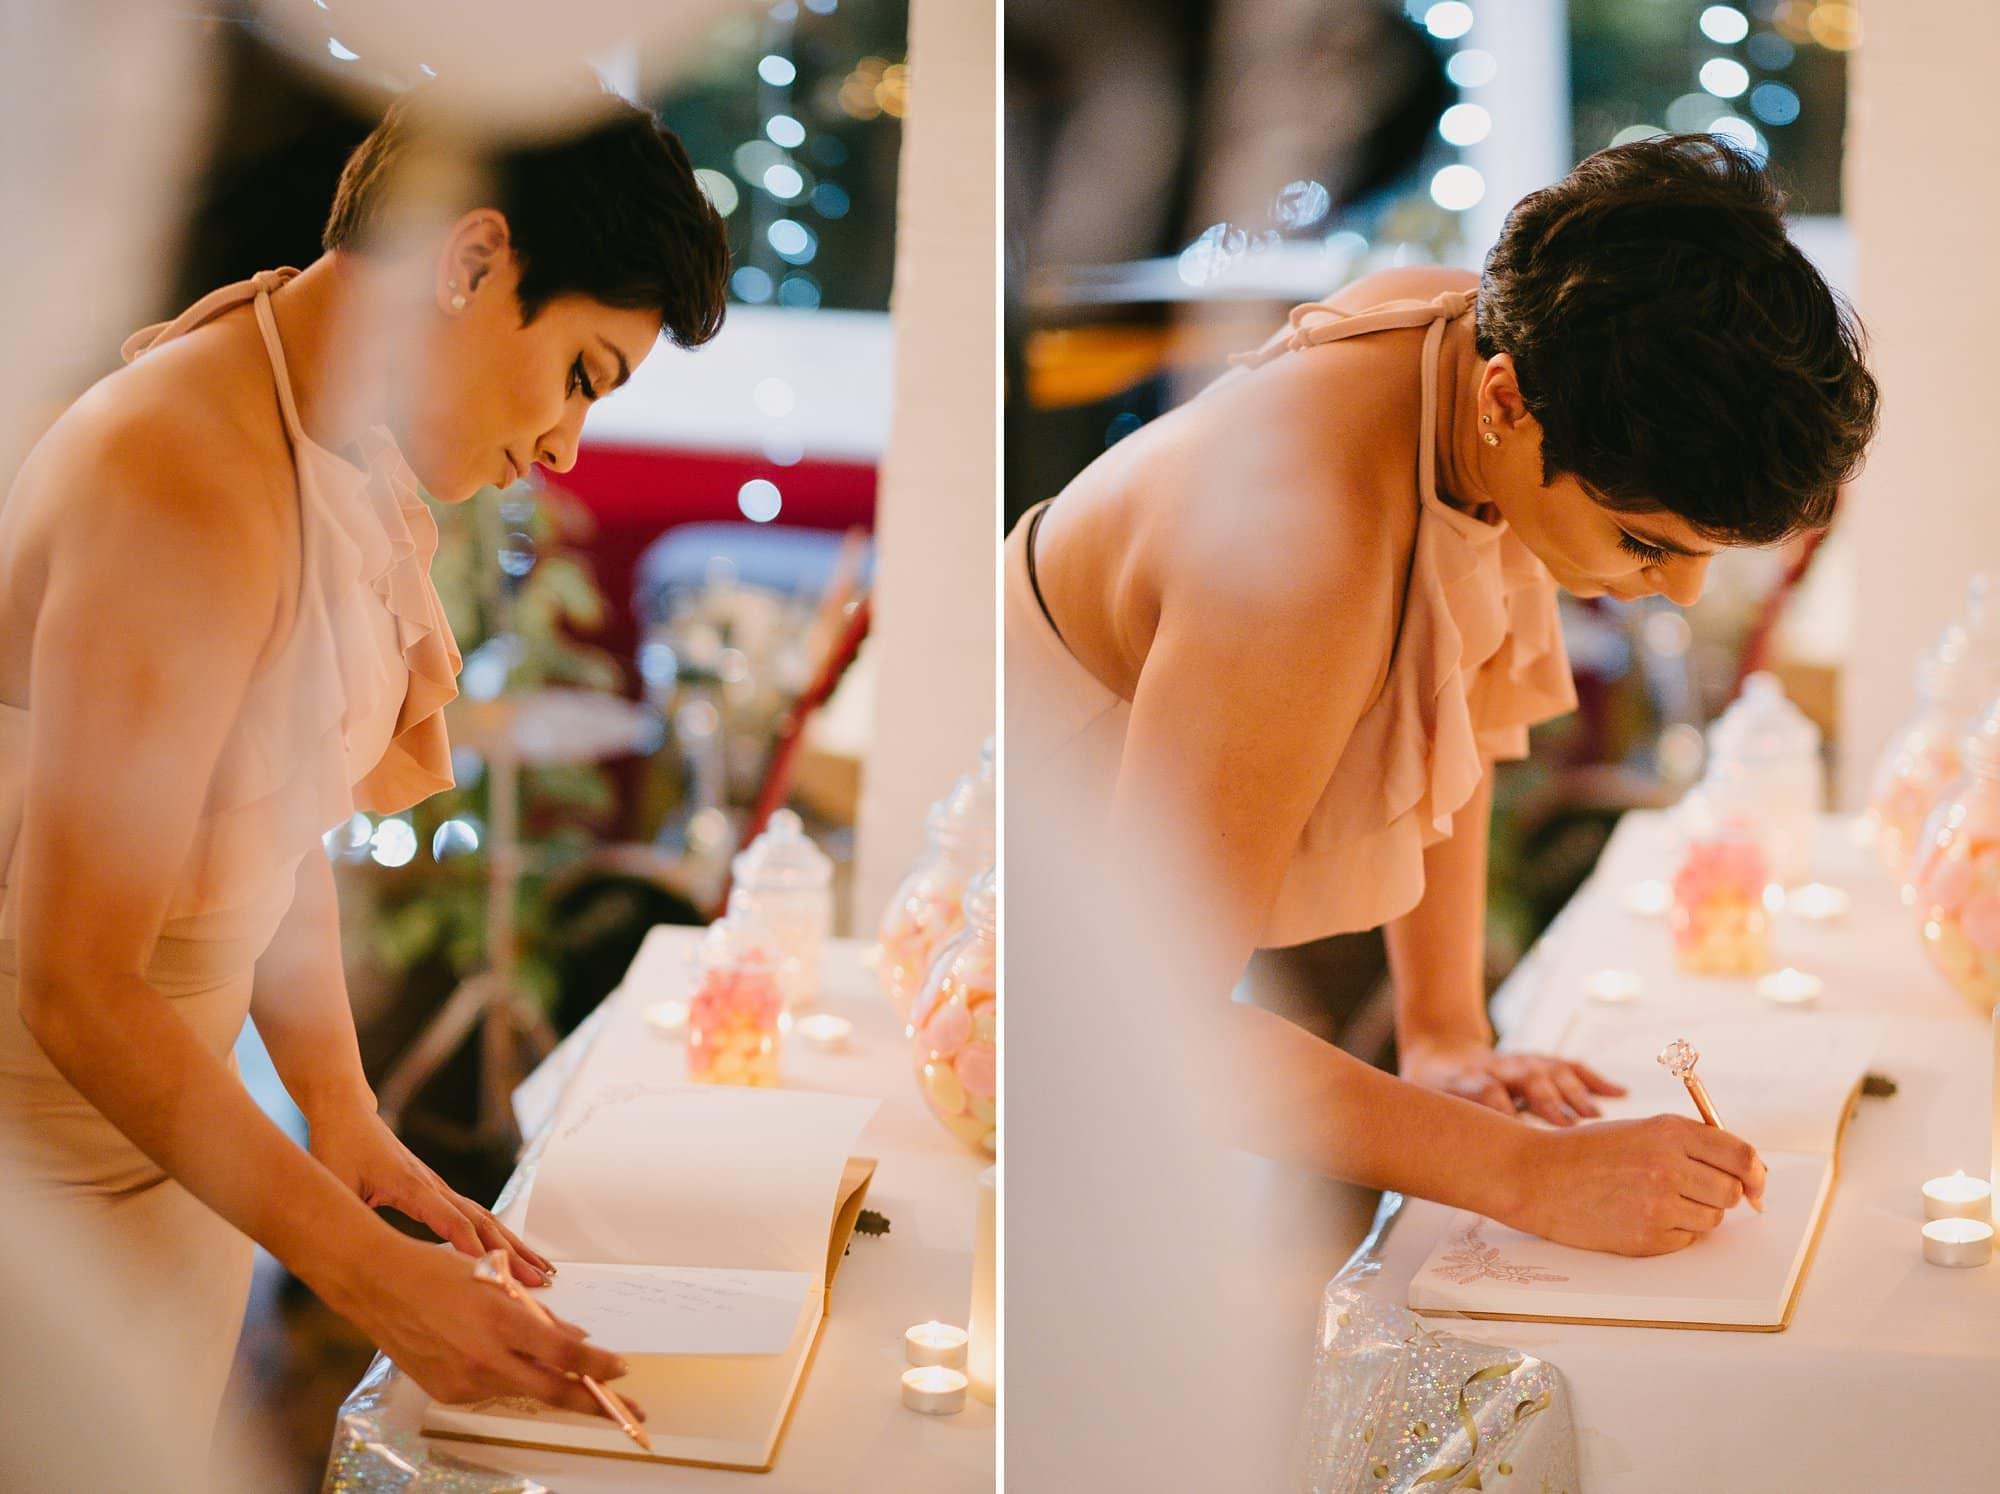 asia house london wedding photographer 041 - Rachel + Gabriel   Asia House Wedding Photography